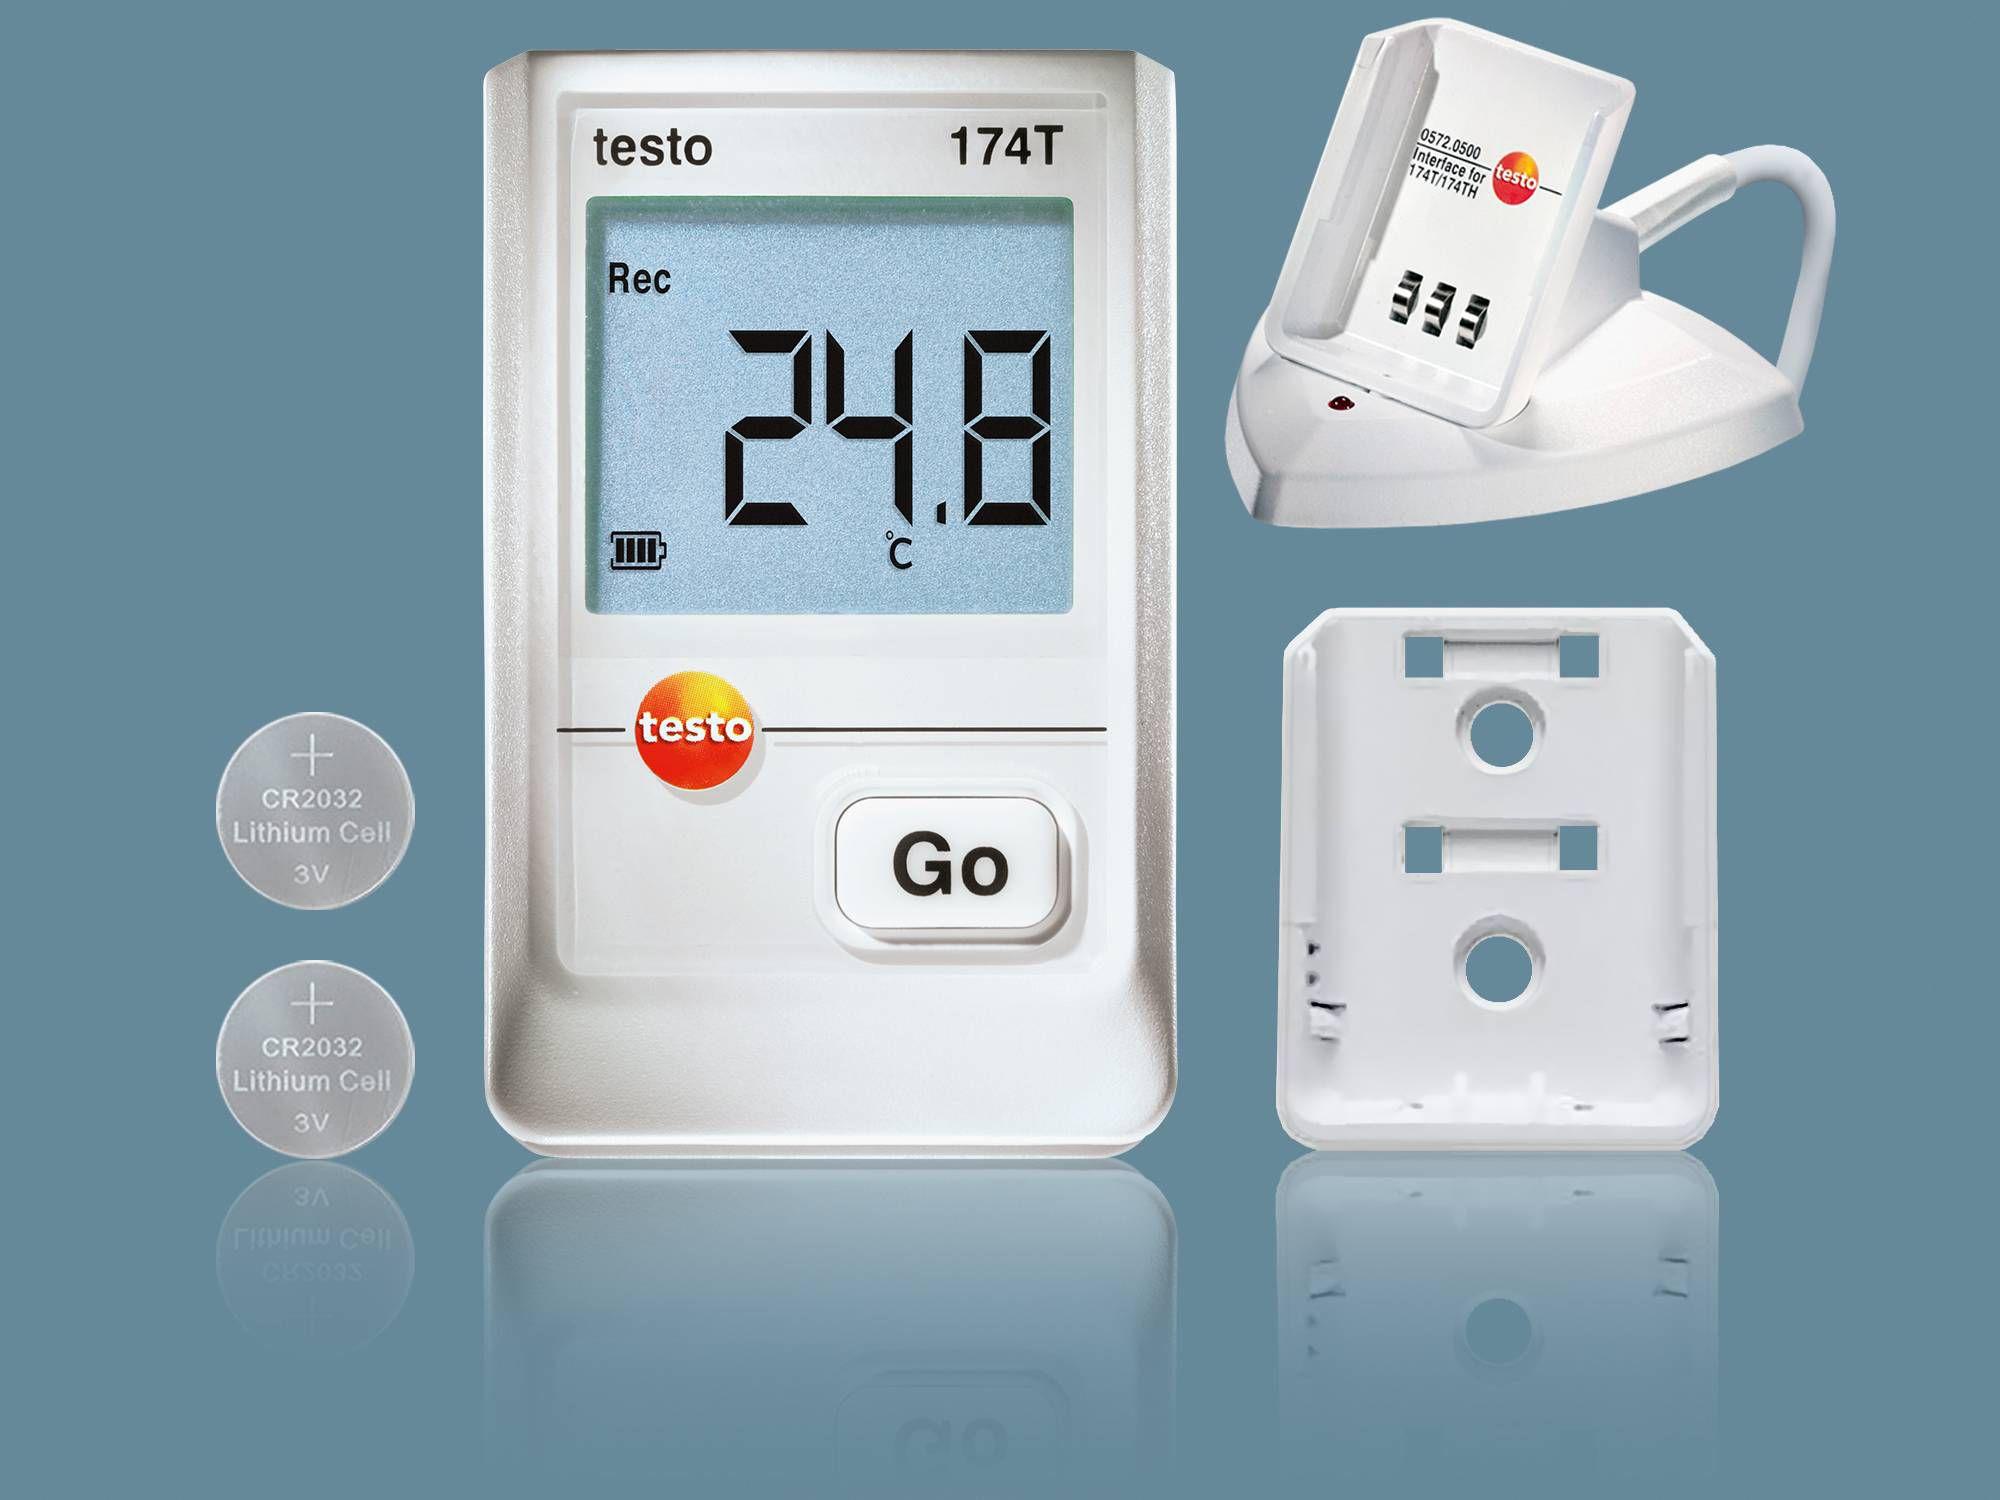 Data logger for food safety testo 174 T kit